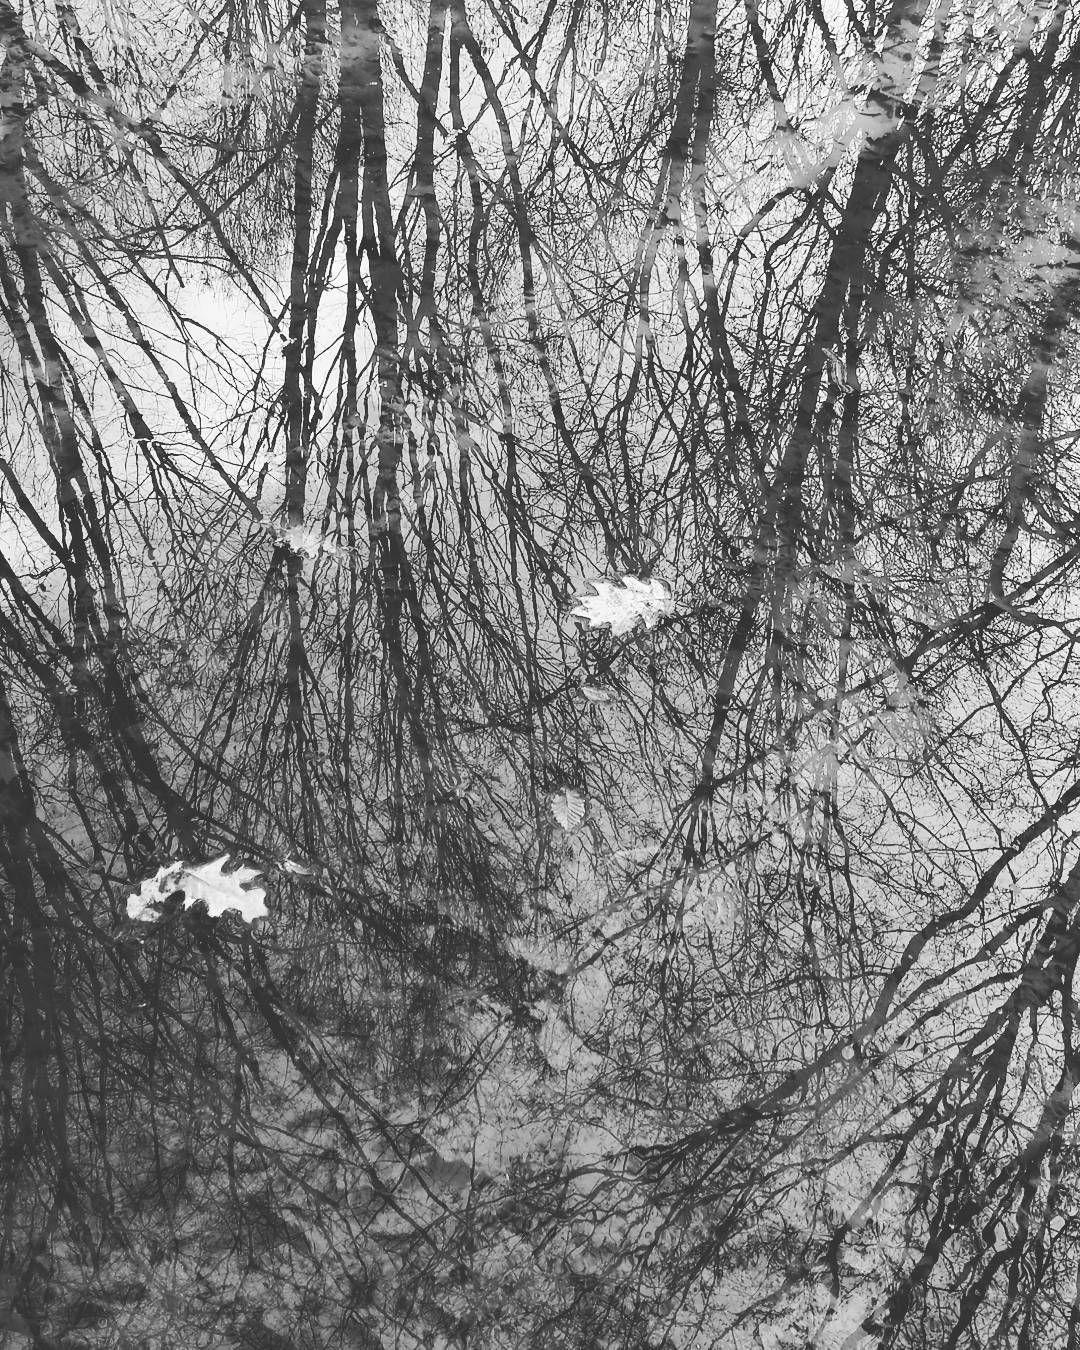 #boscoincittà #Milano #milanocityofficial #milanodavedere #ig_milan #instamilano #instamilanocity #ilovemilano #welovemilan #milano_forever #igclub_hdr #trees #alberi #foglie by pakoloco